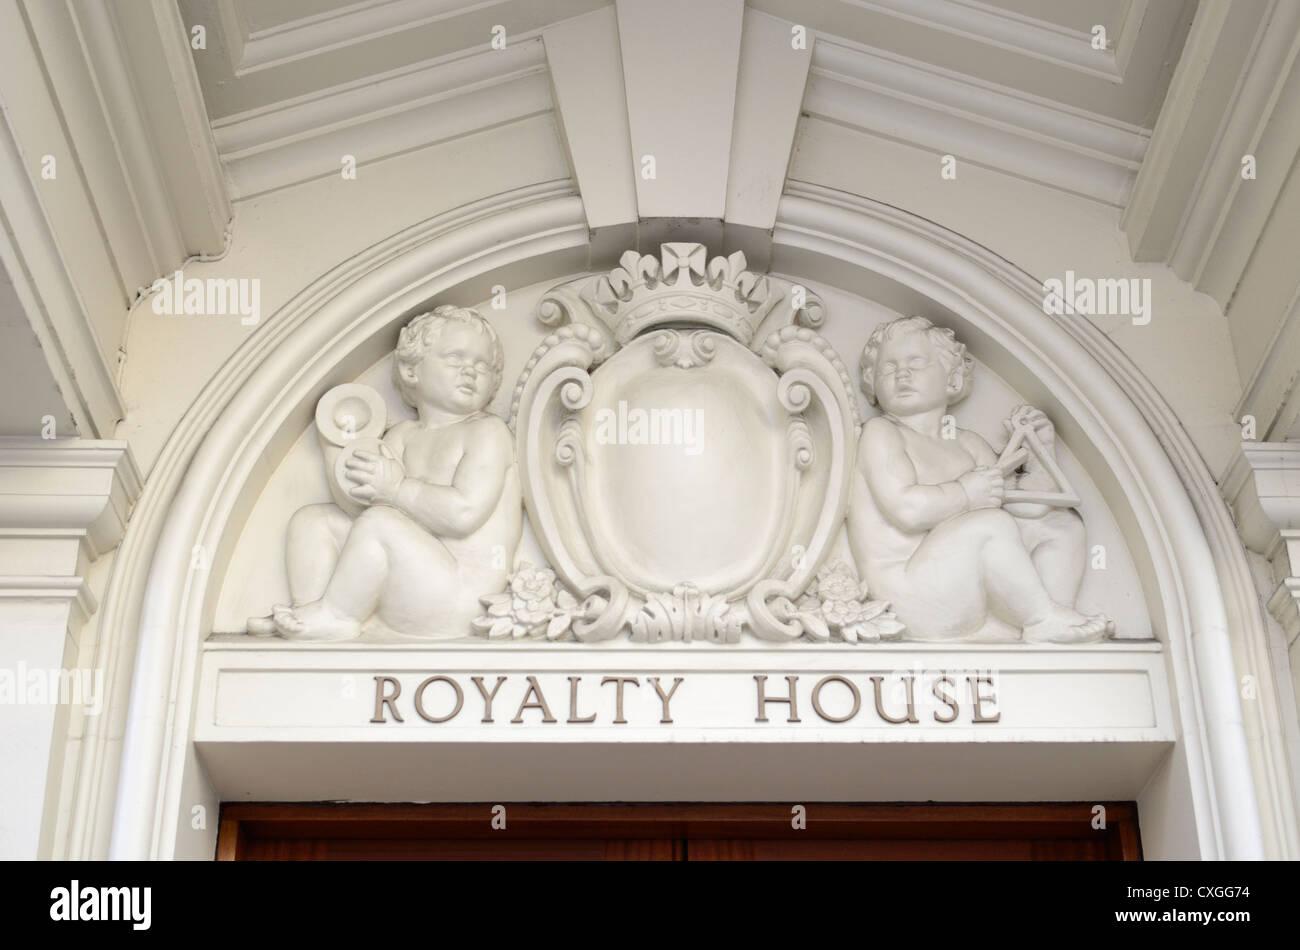 Royalty House in Dean Street, Soho, London, England - Stock Image